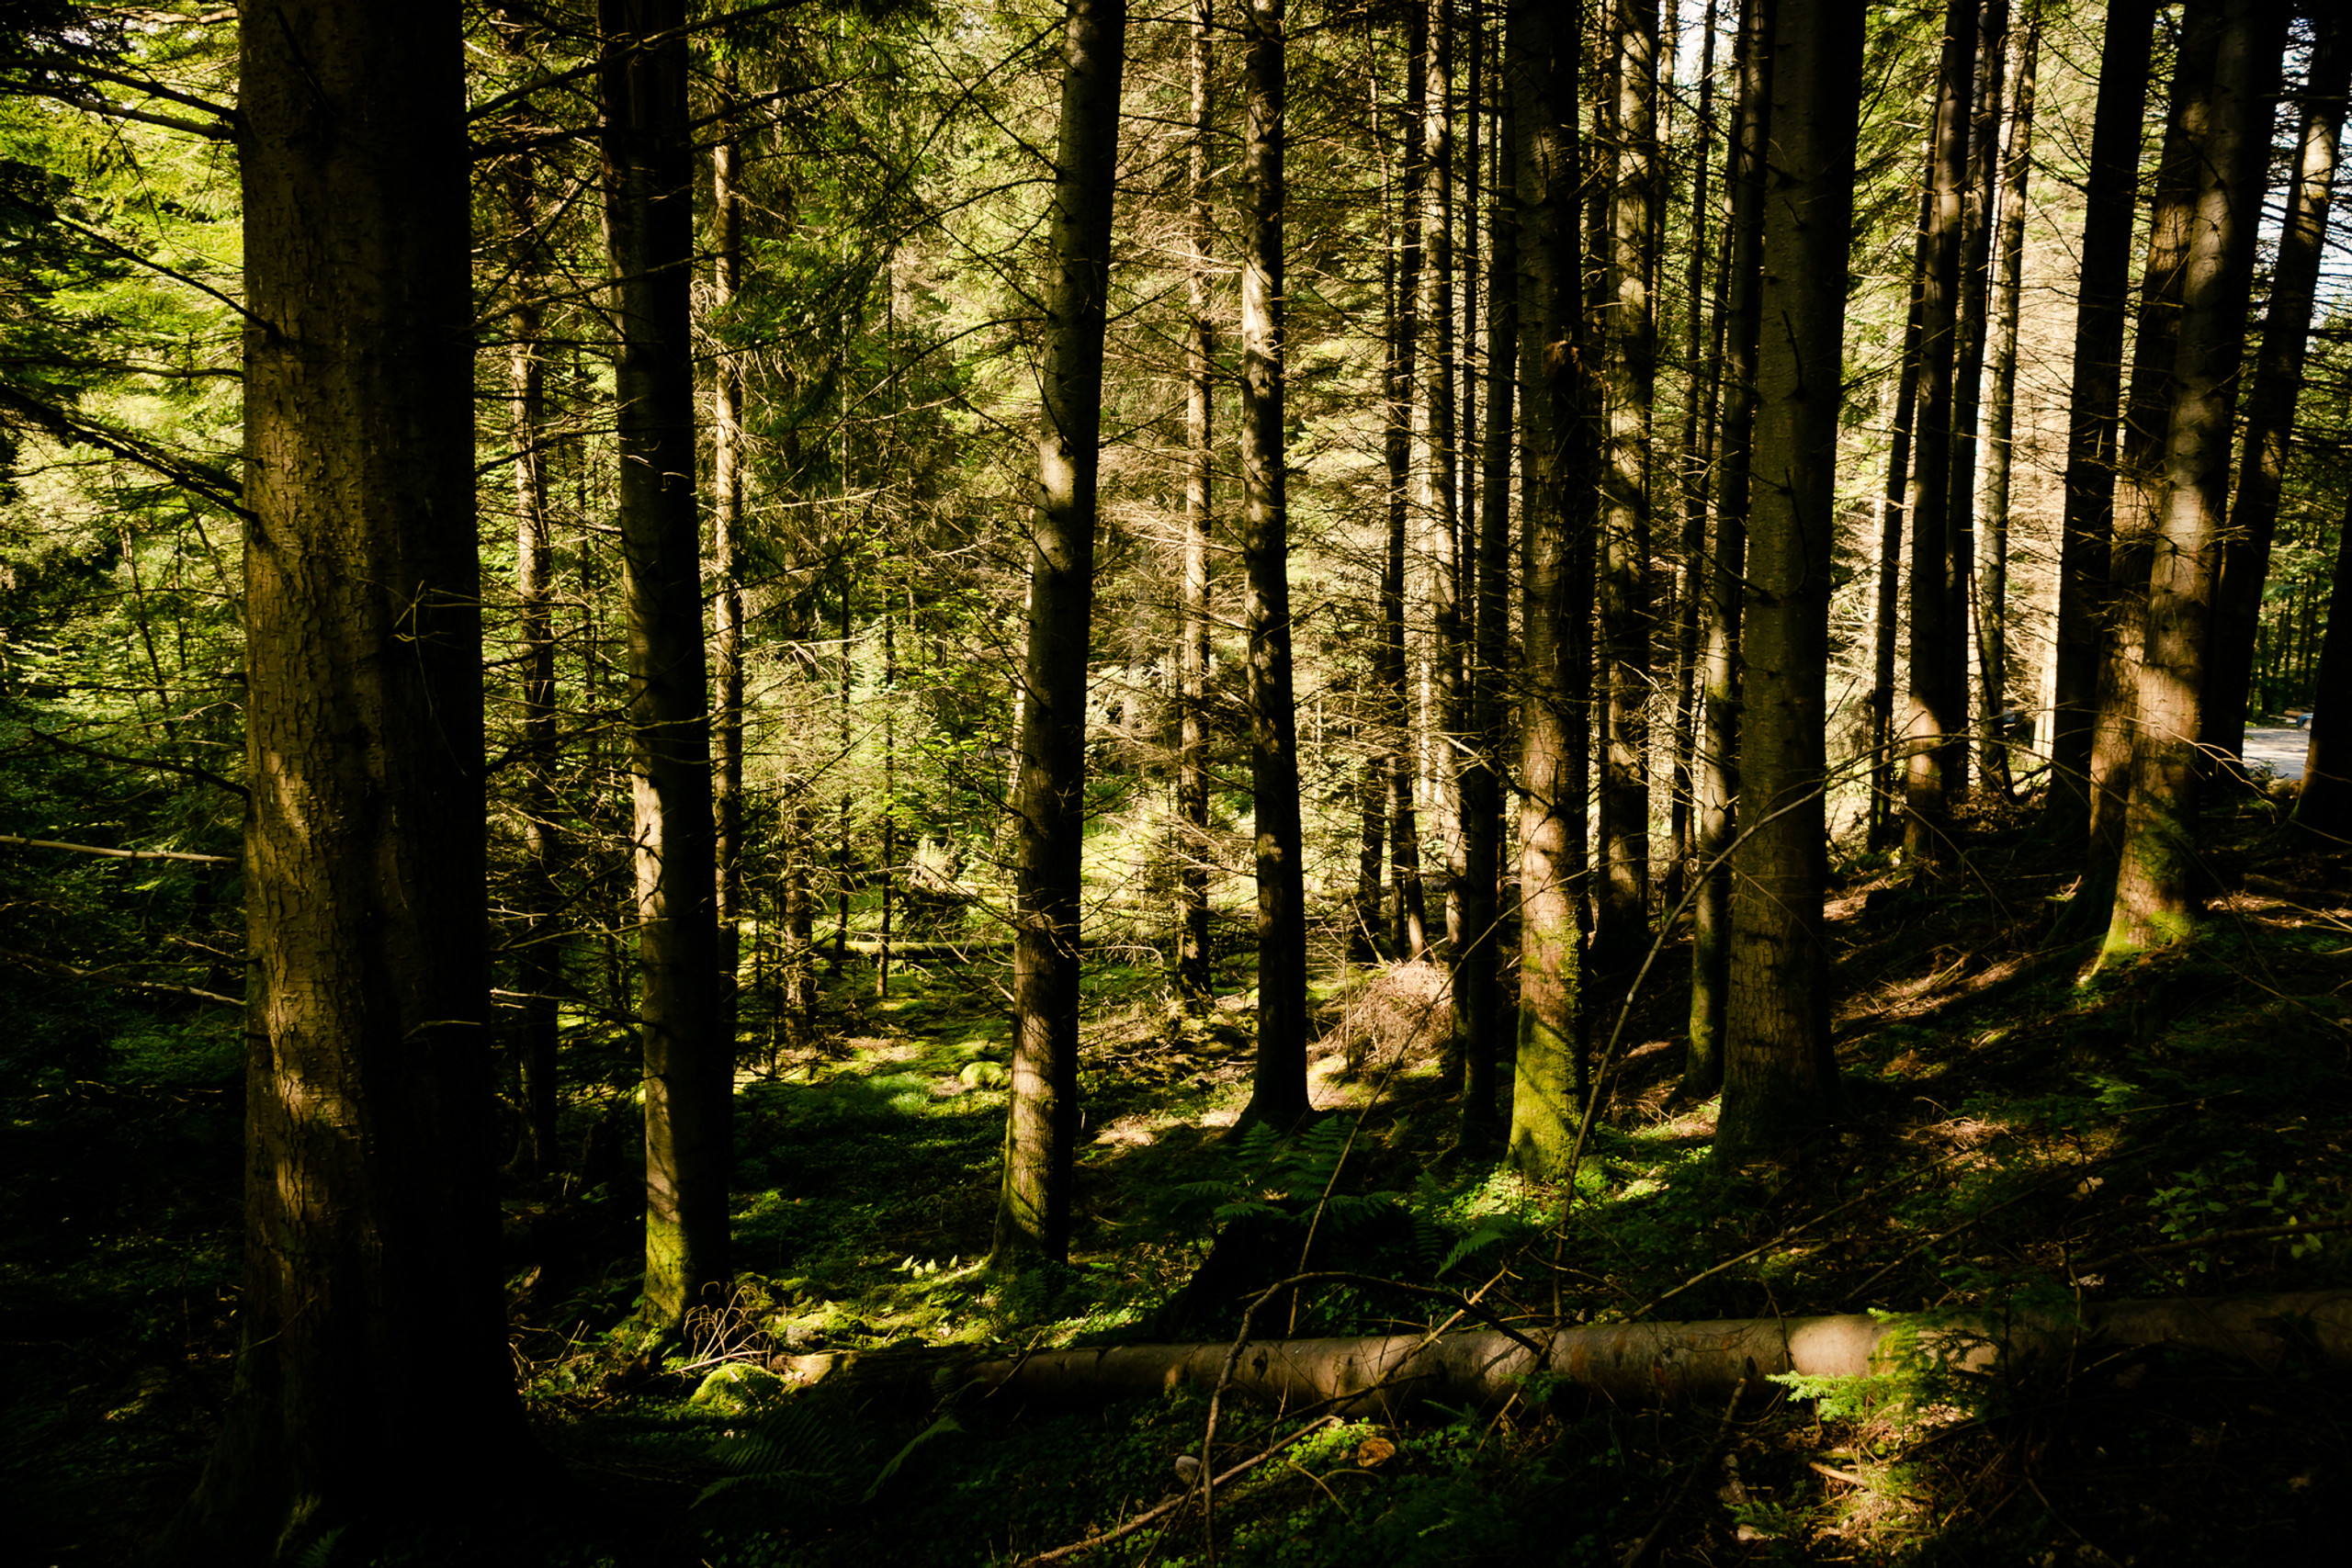 An Enchanted Forest in Scottish Highlands. Scotland, landscapes, hiking